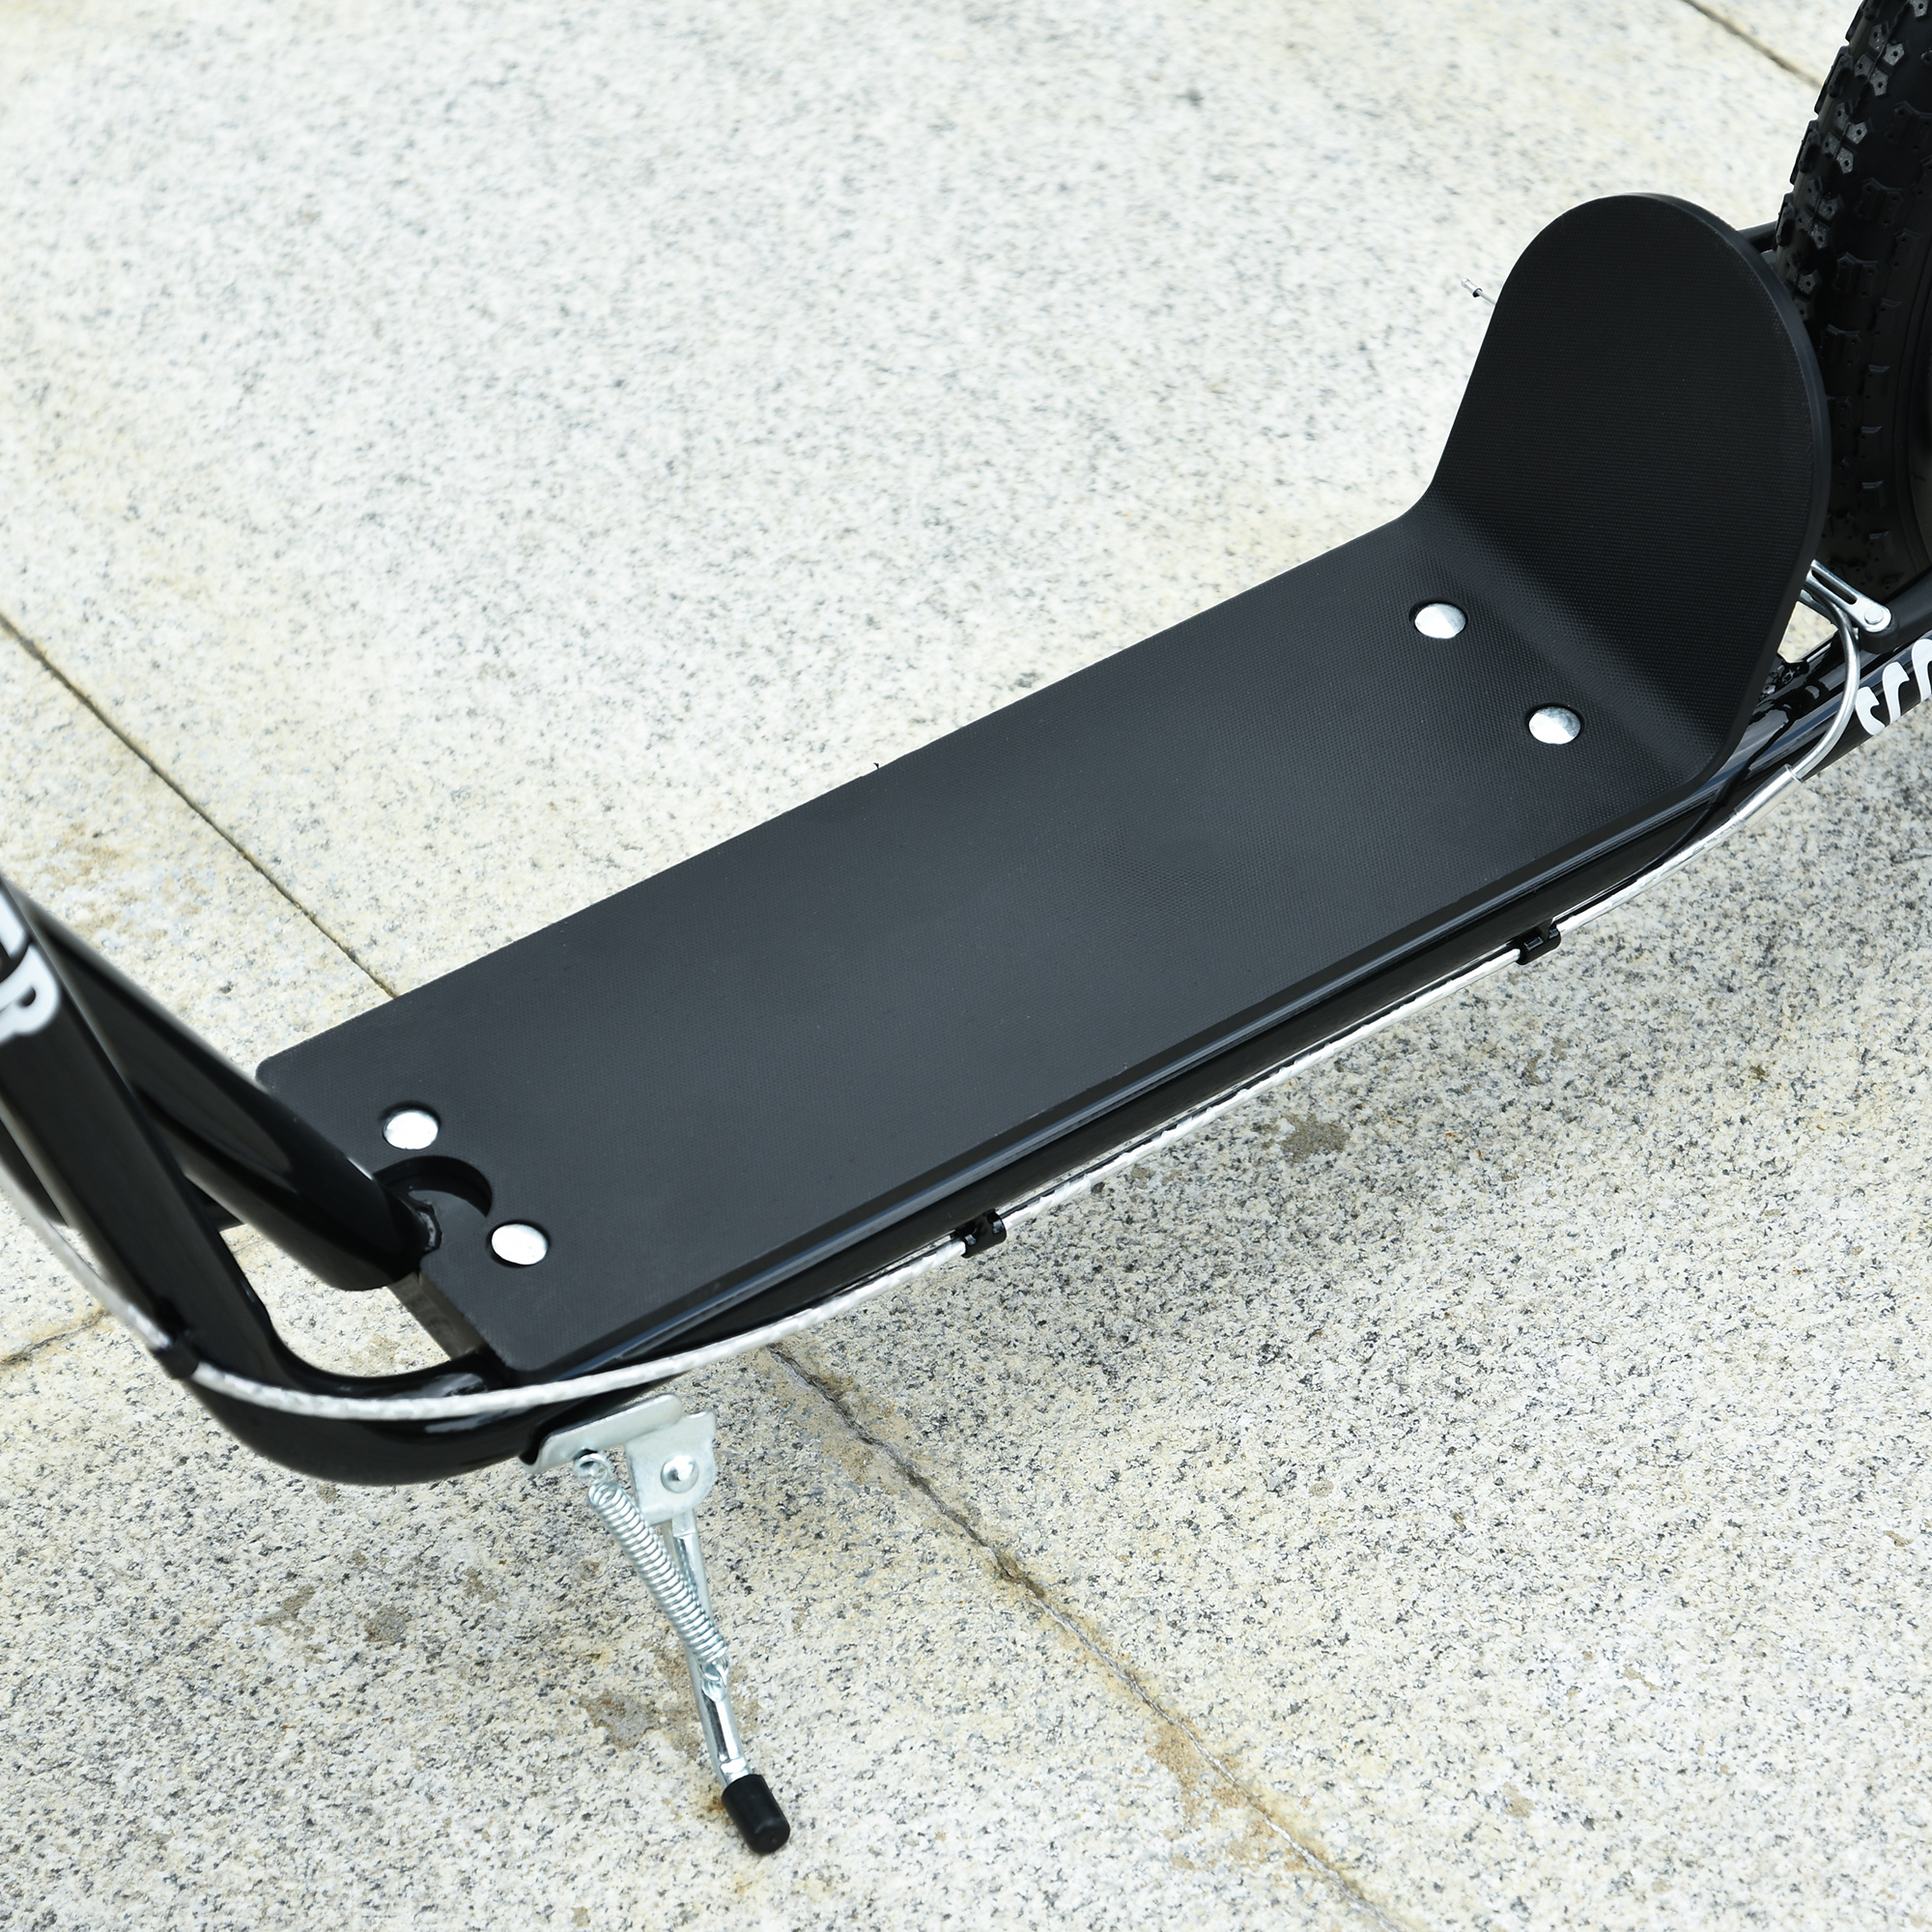 Indexbild 37 - HOMCOM-Tretroller-Kinderroller-Scooter-Cityroller-Roller-verstellbar-Blau-Gruen